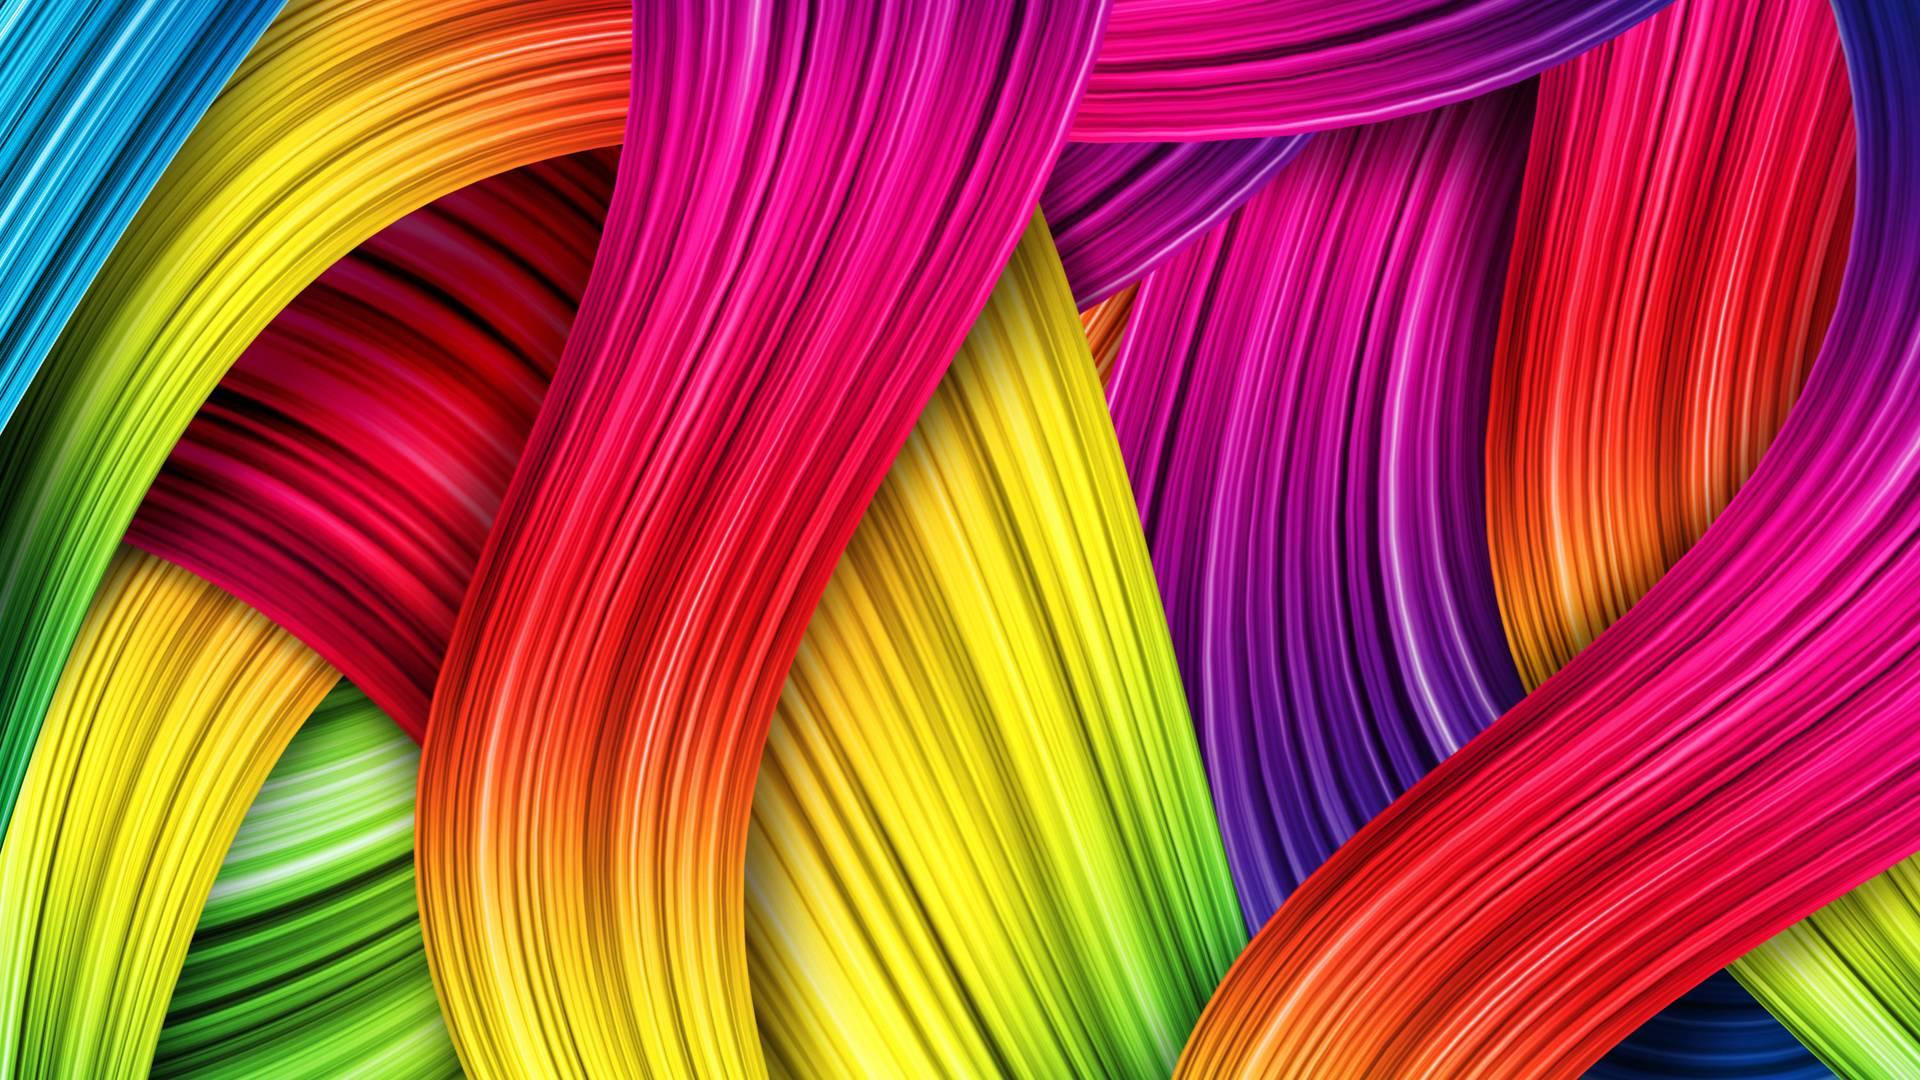 thread wallpaper backgrounds -#main